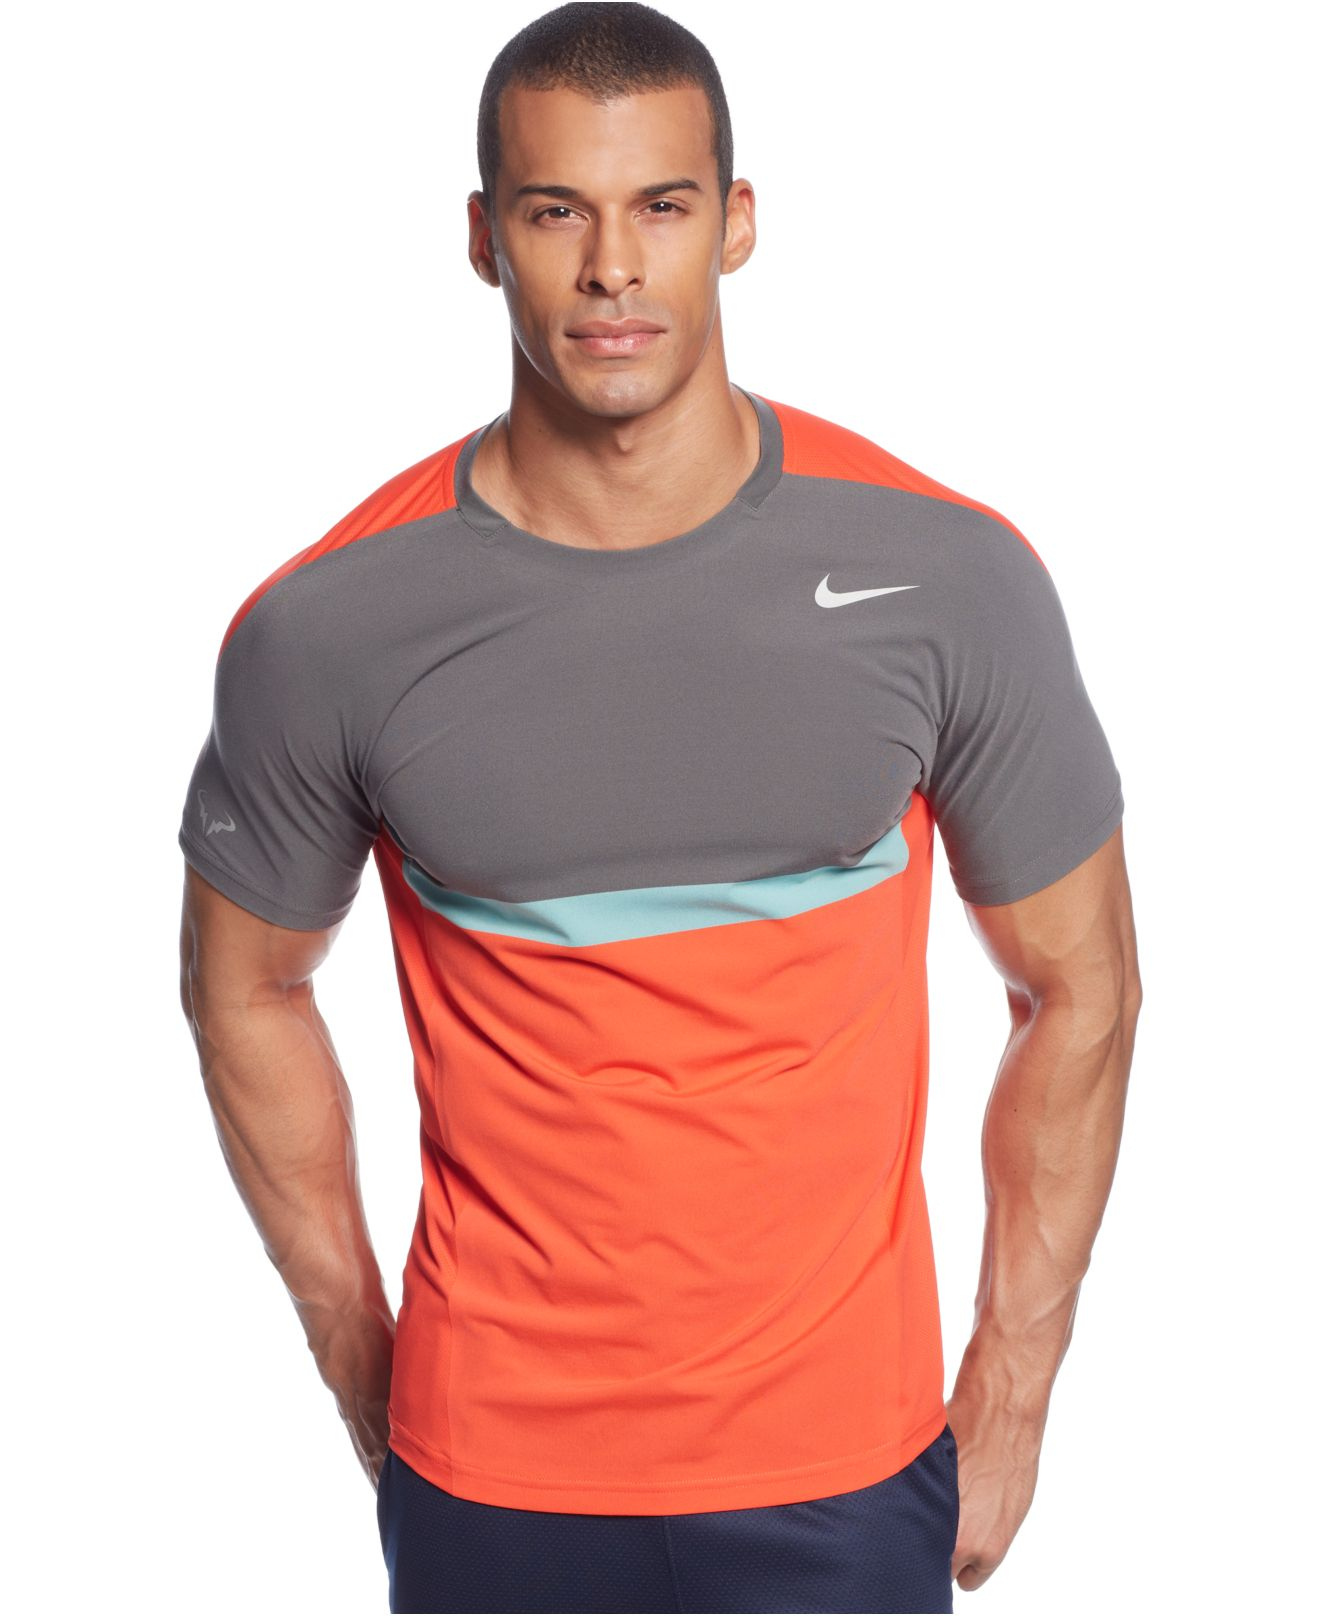 5ef342f33c34 Lyst - Nike Premier Rafa Performance T-Shirt in Orange for Men